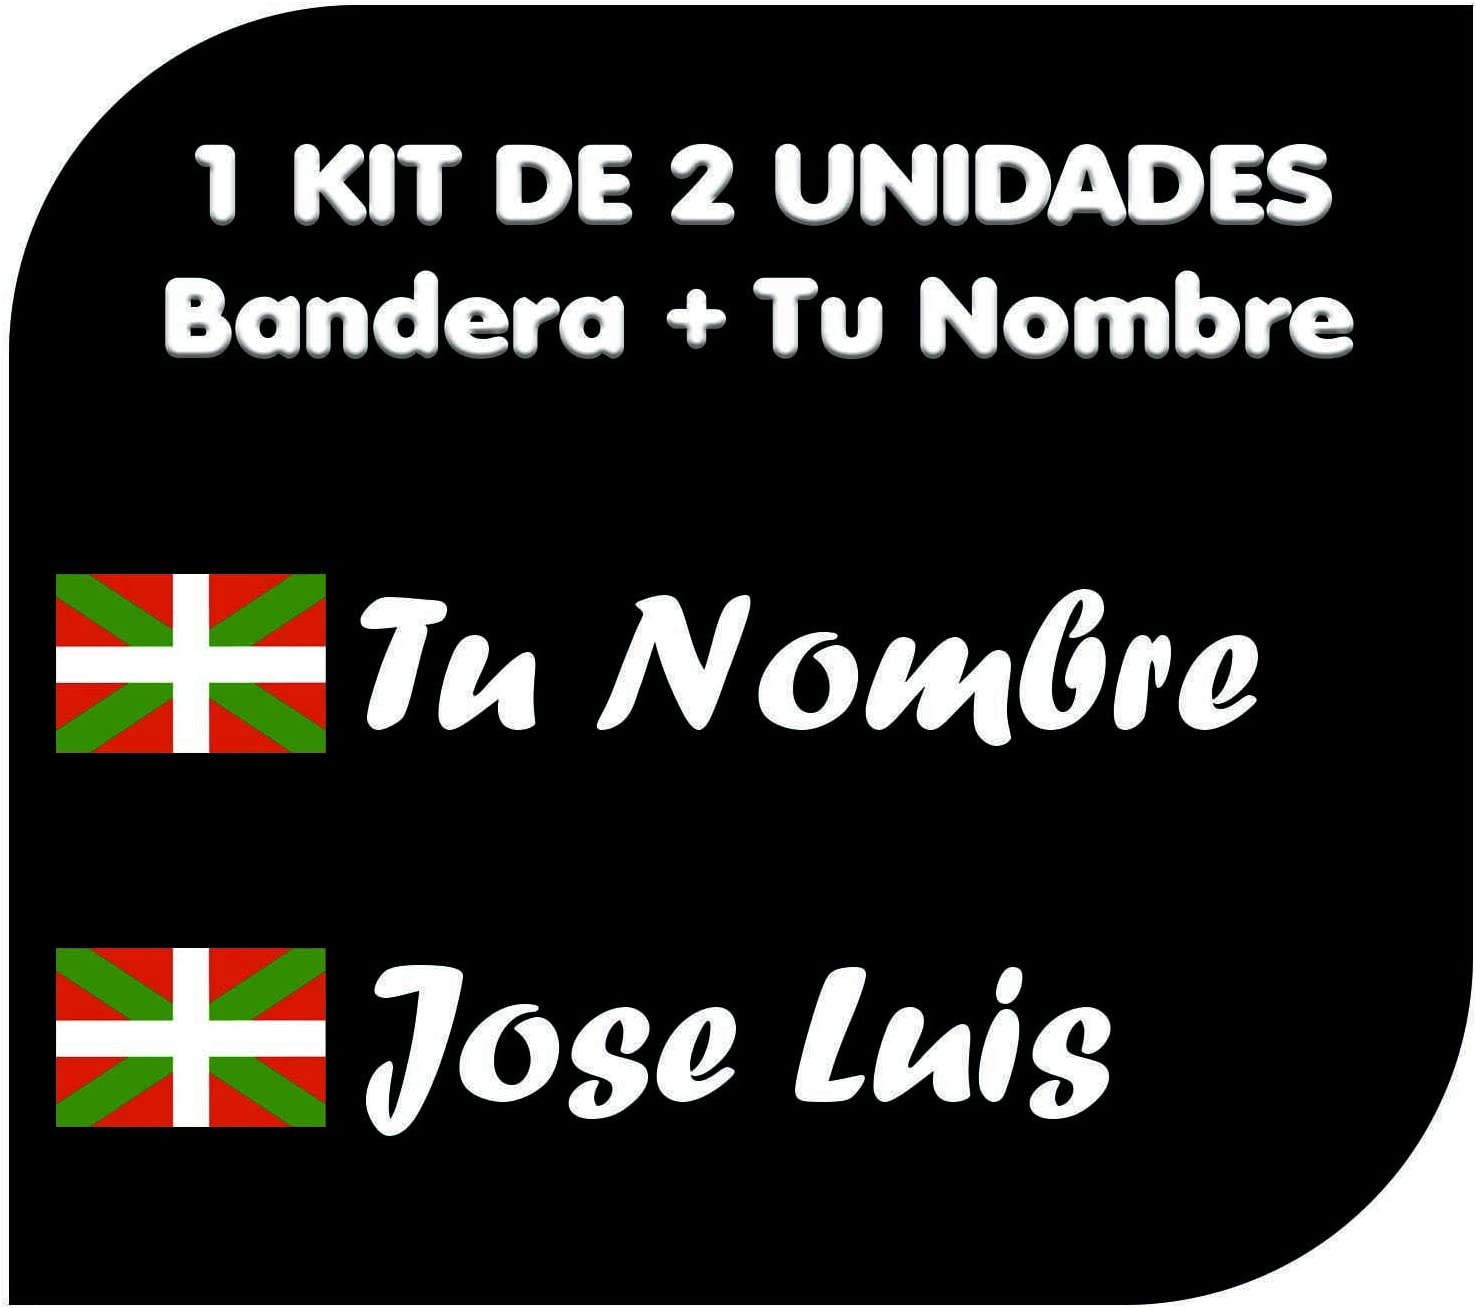 Pegatina Vinilo Bandera Pais Vasco (Ikurriña) + tu Nombre - Bici, Casco, Pala De Padel, Monopatin, Coche, Moto, etc. Kit de Dos Vinilos (Pack Fuentes 1): Amazon.es: Coche y moto